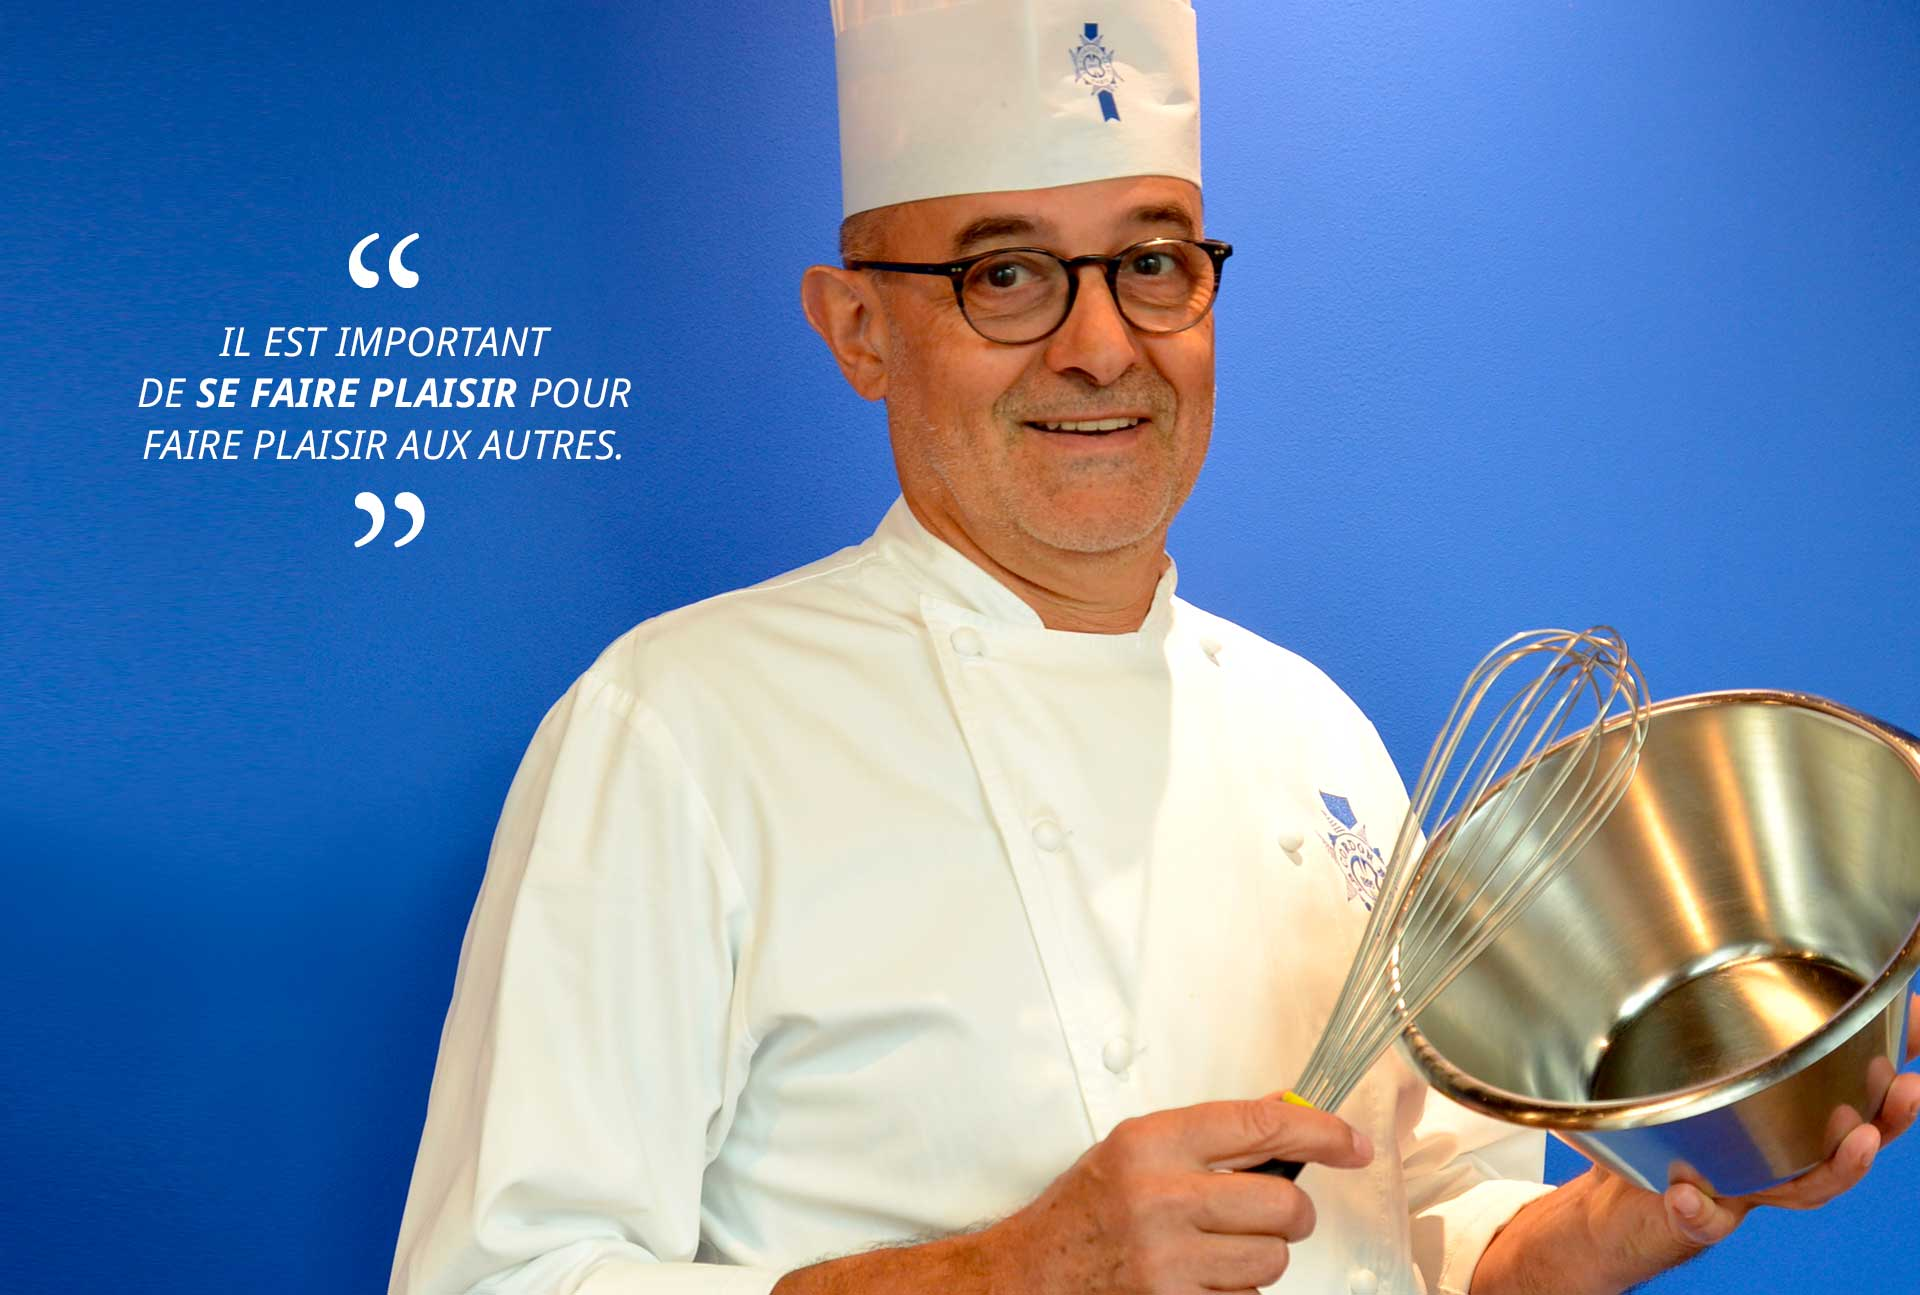 Chef Tranchant pâtissier